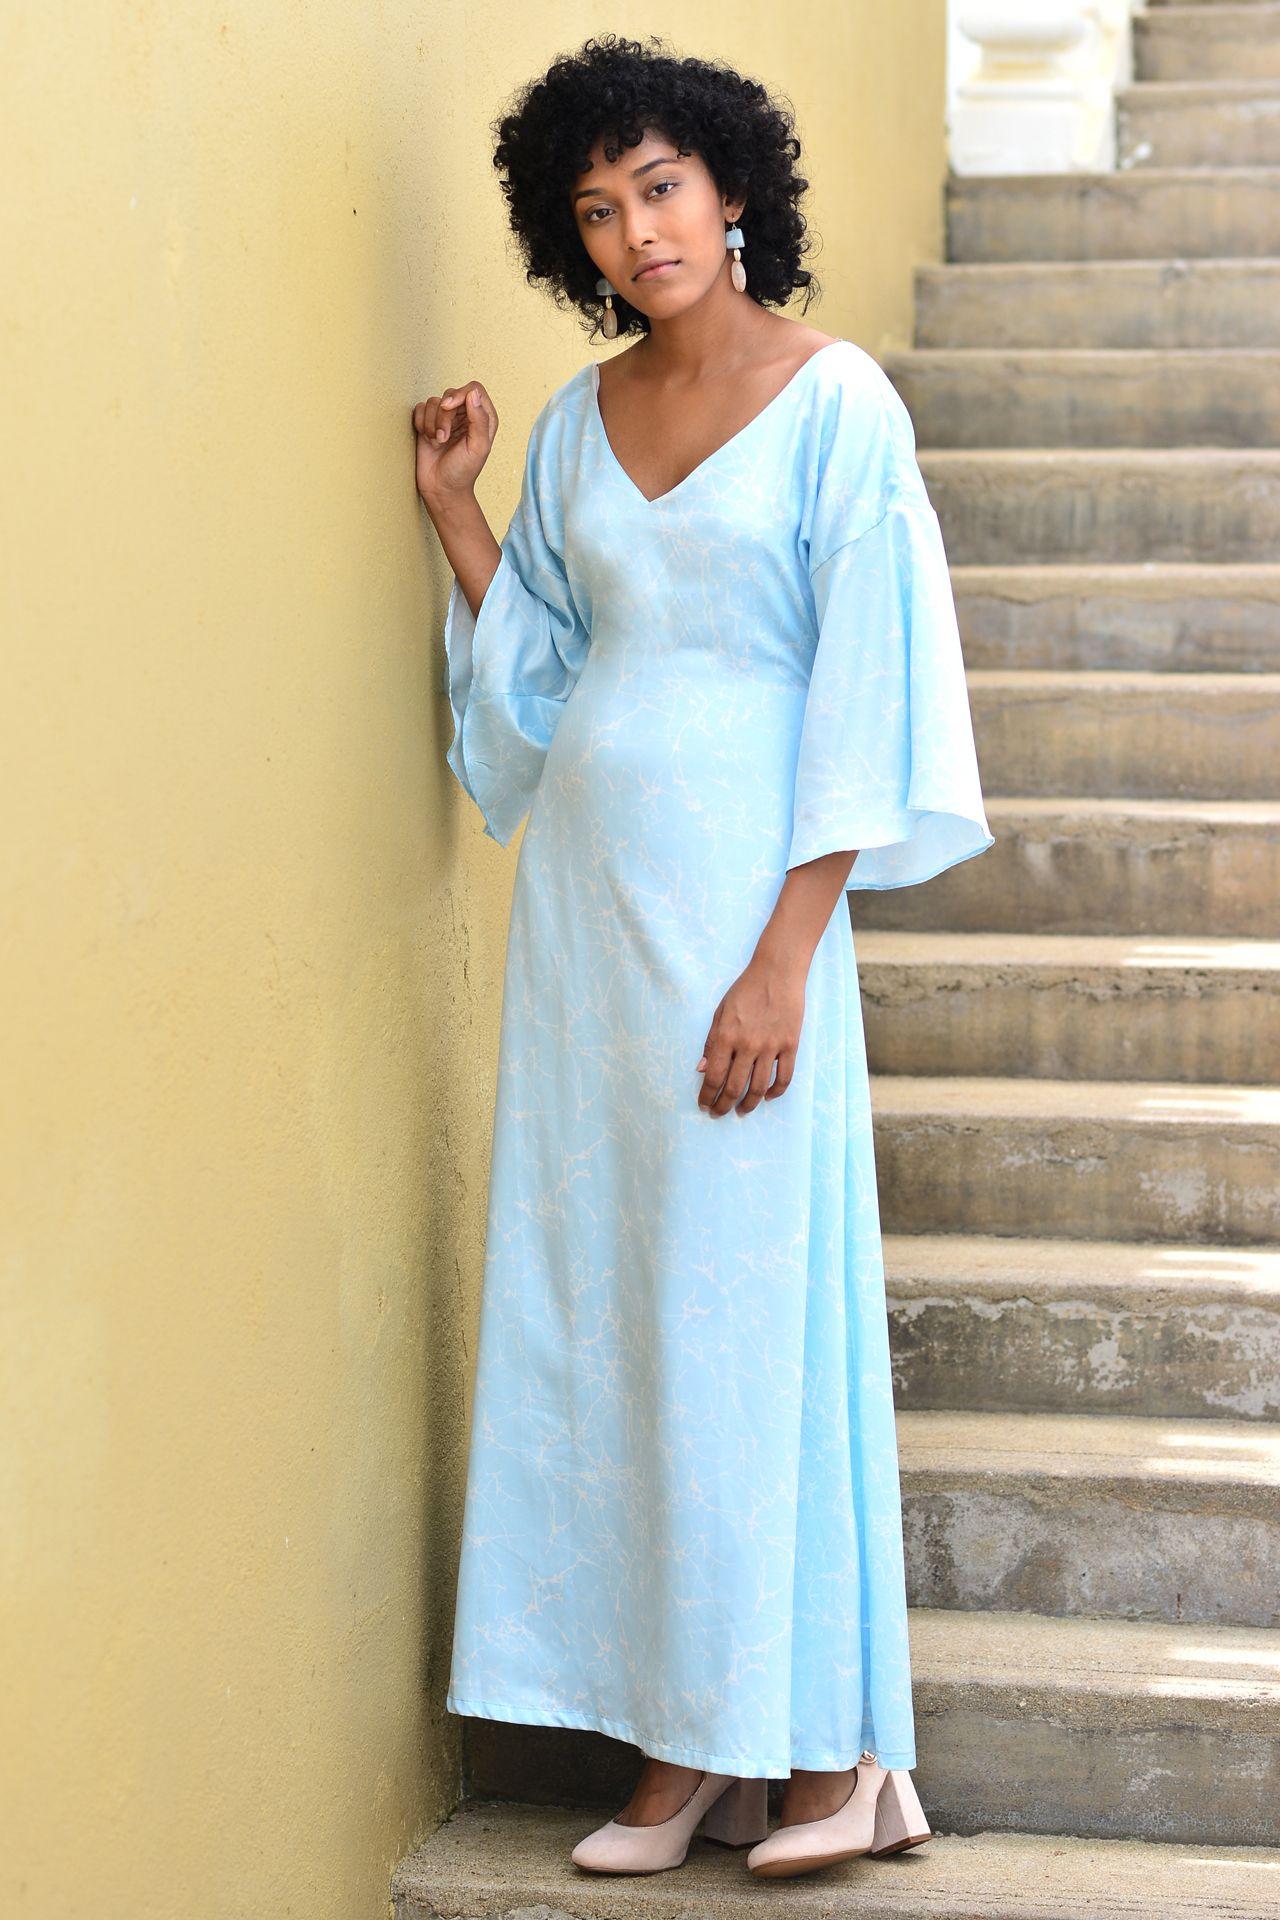 41473160dd The Cerulean Maxi has a subtle white crack print throughout the dress. This maxi  dress